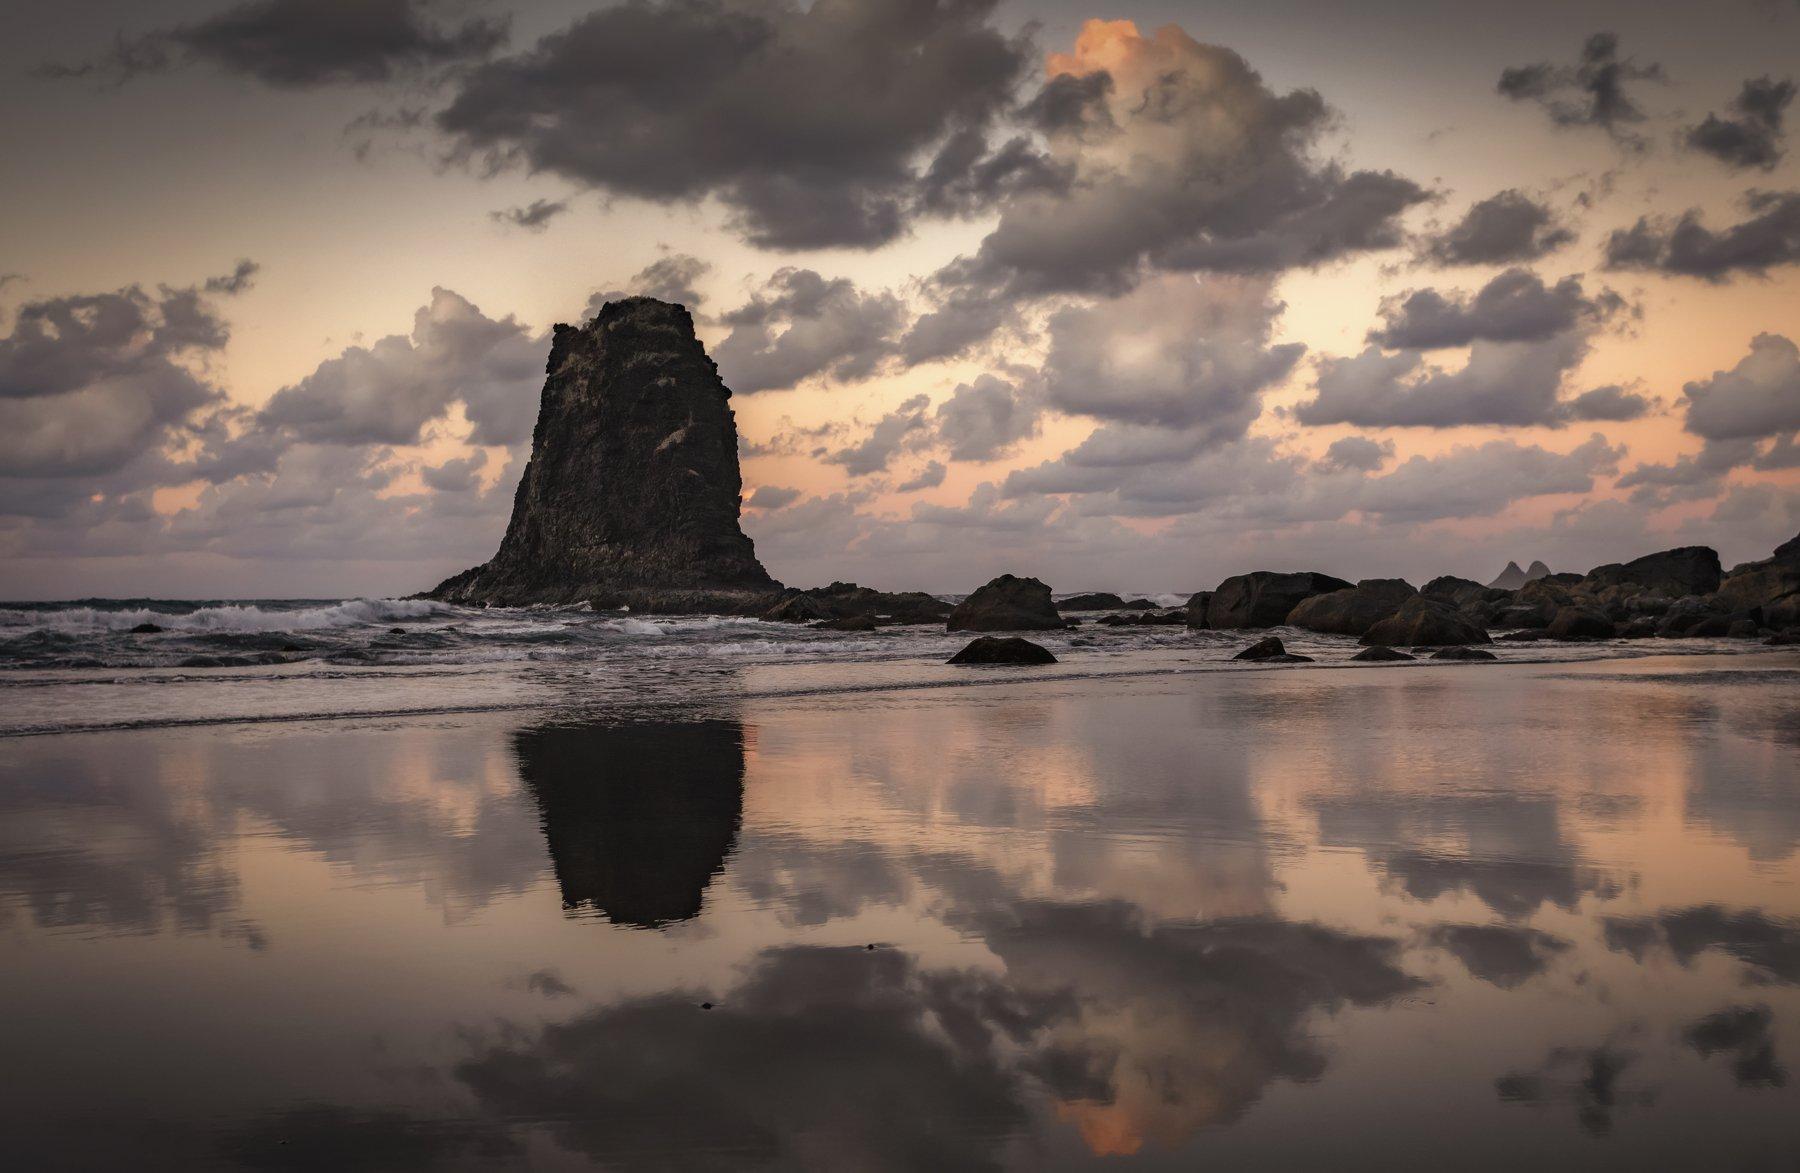 пляж, океан, скала, Alexandr Bezmolitvenny